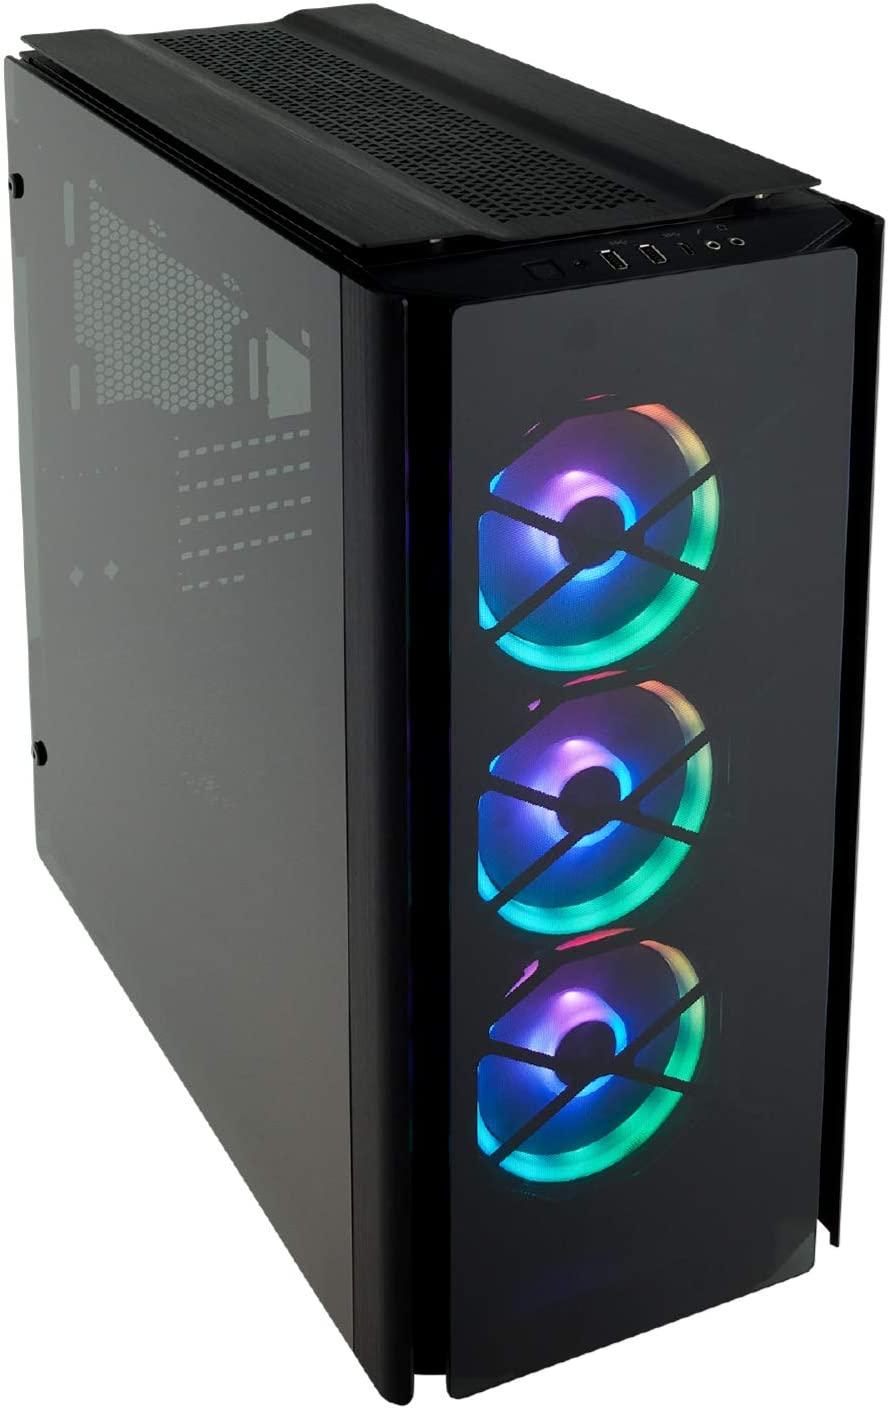 Amazon: Corsair Obsidian 500D RGB SE